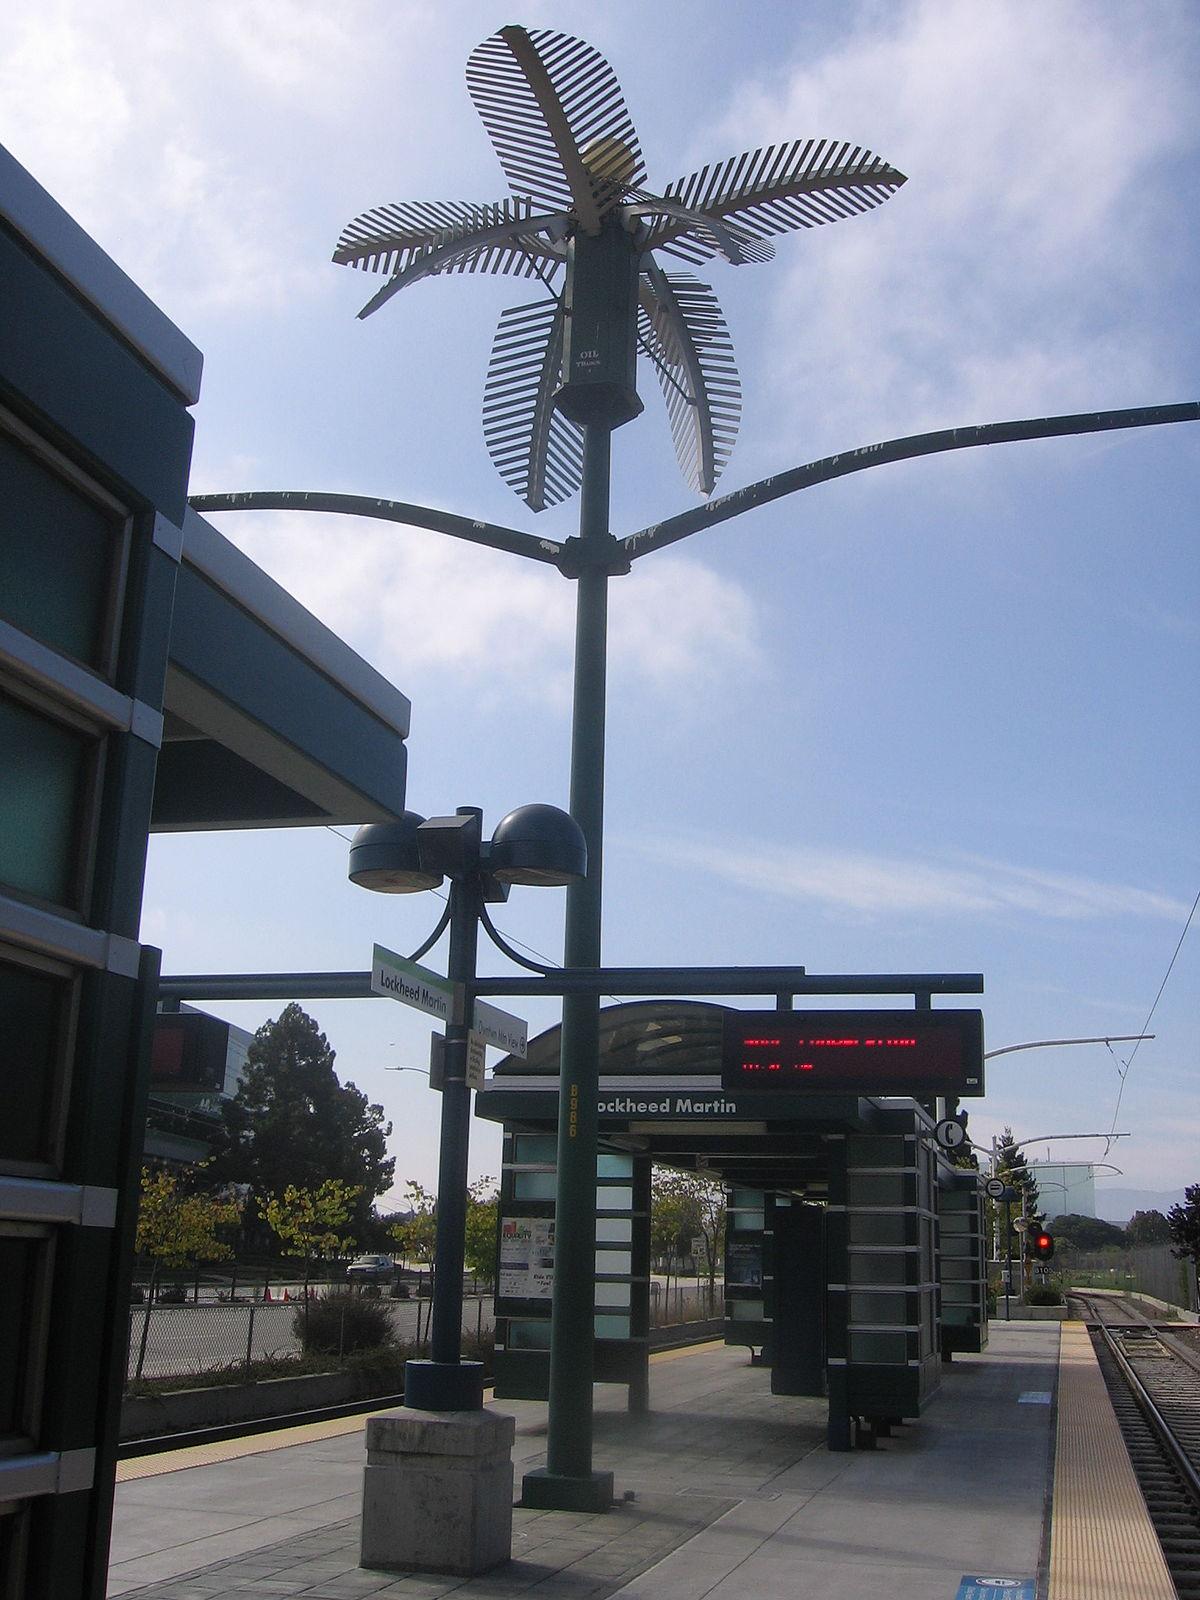 Lockheed Martin Transit Center Wikipedia